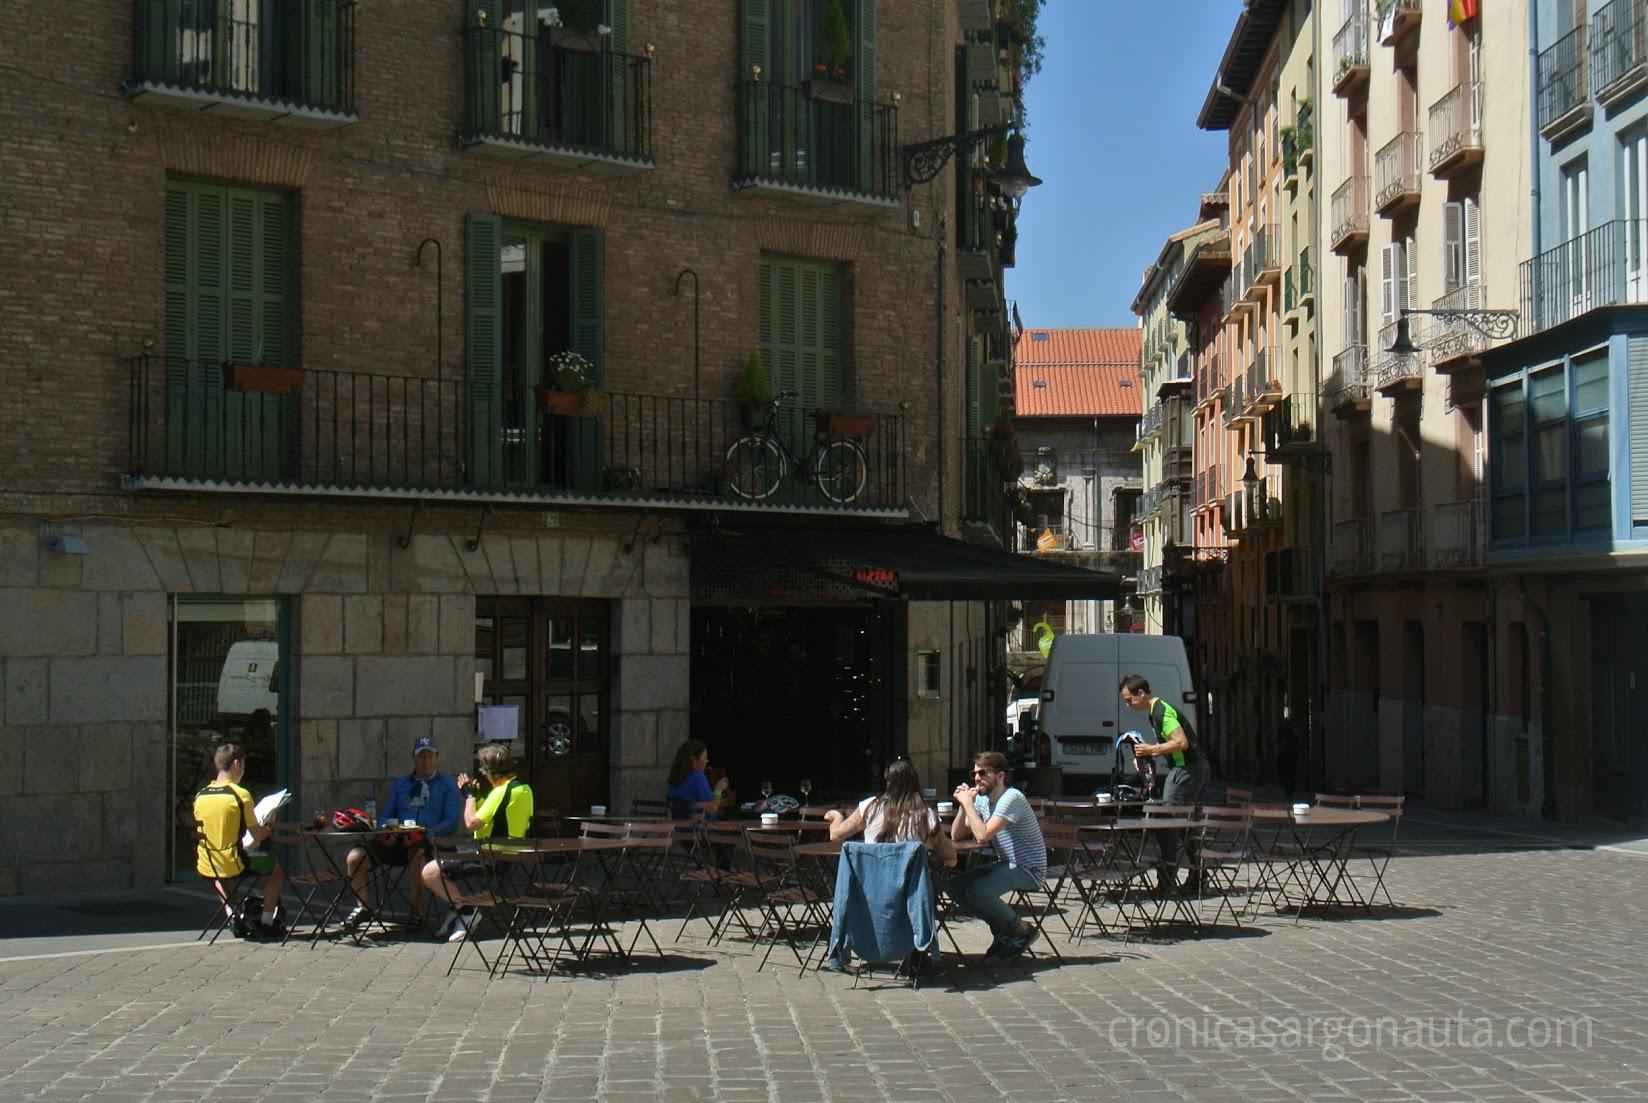 Pelegrinos en Pamplona